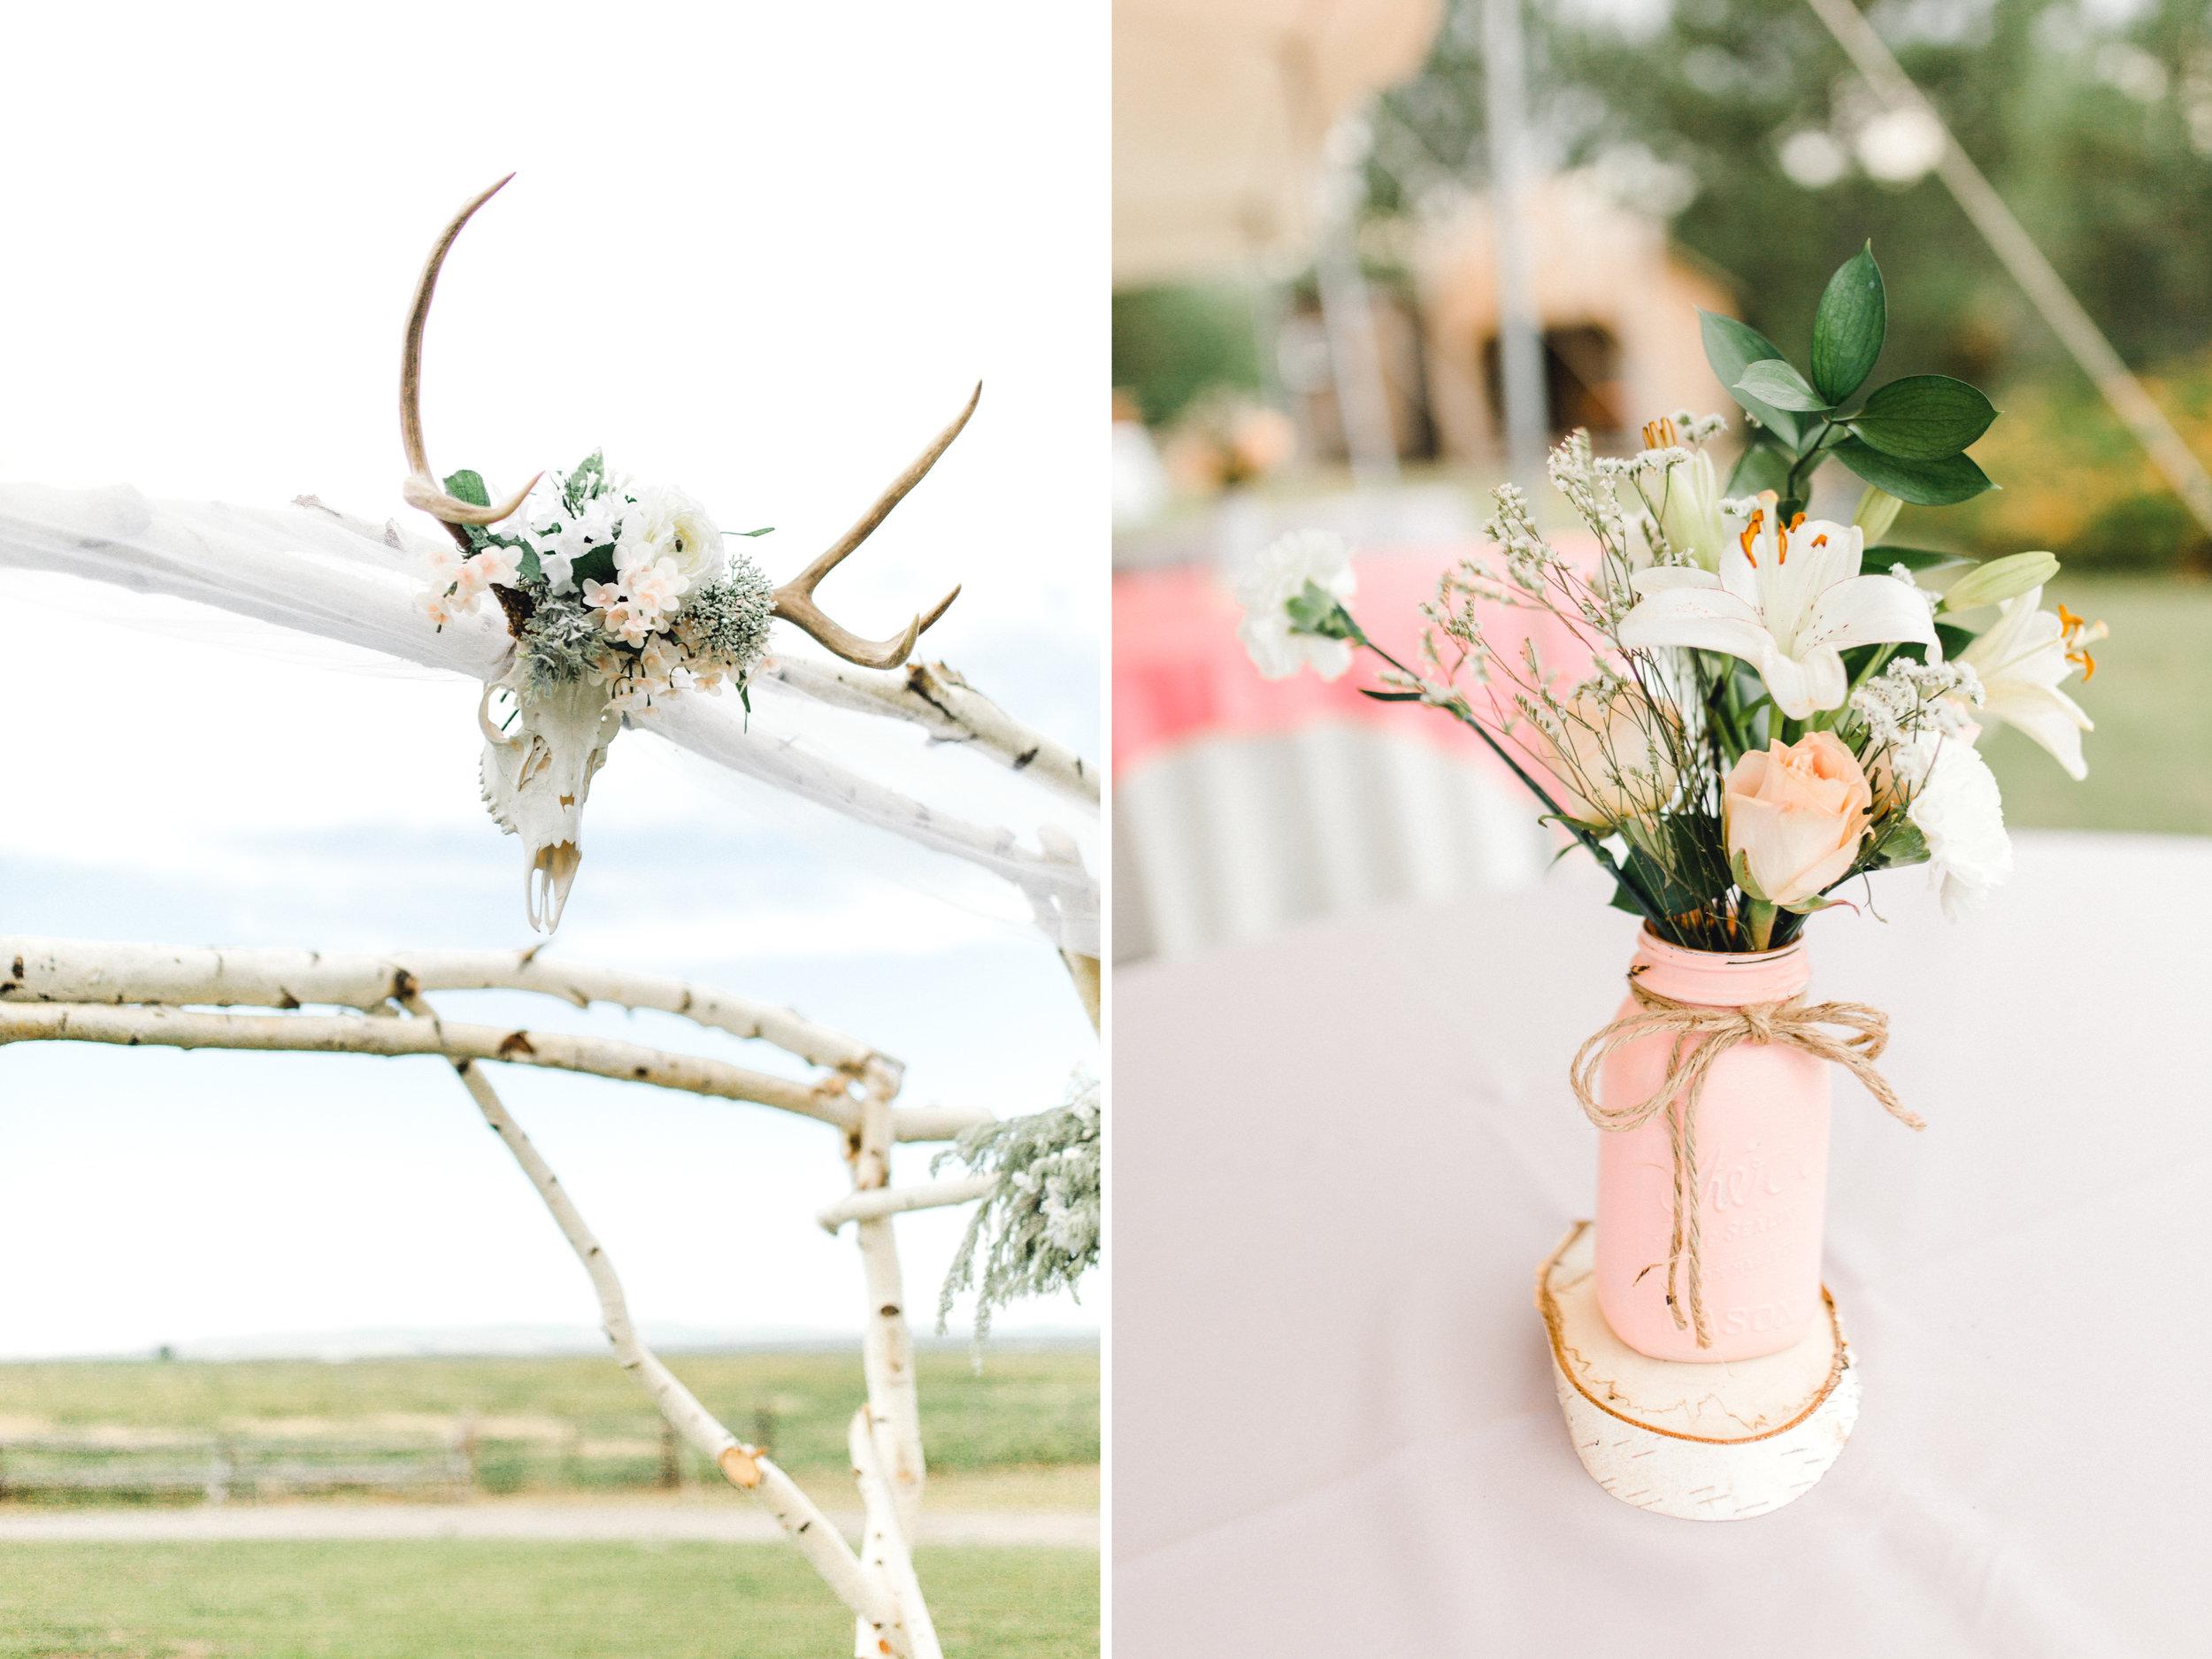 country-outdoor-rustic-wedding-tetons-idaho-anna-christine-photo-15.jpg